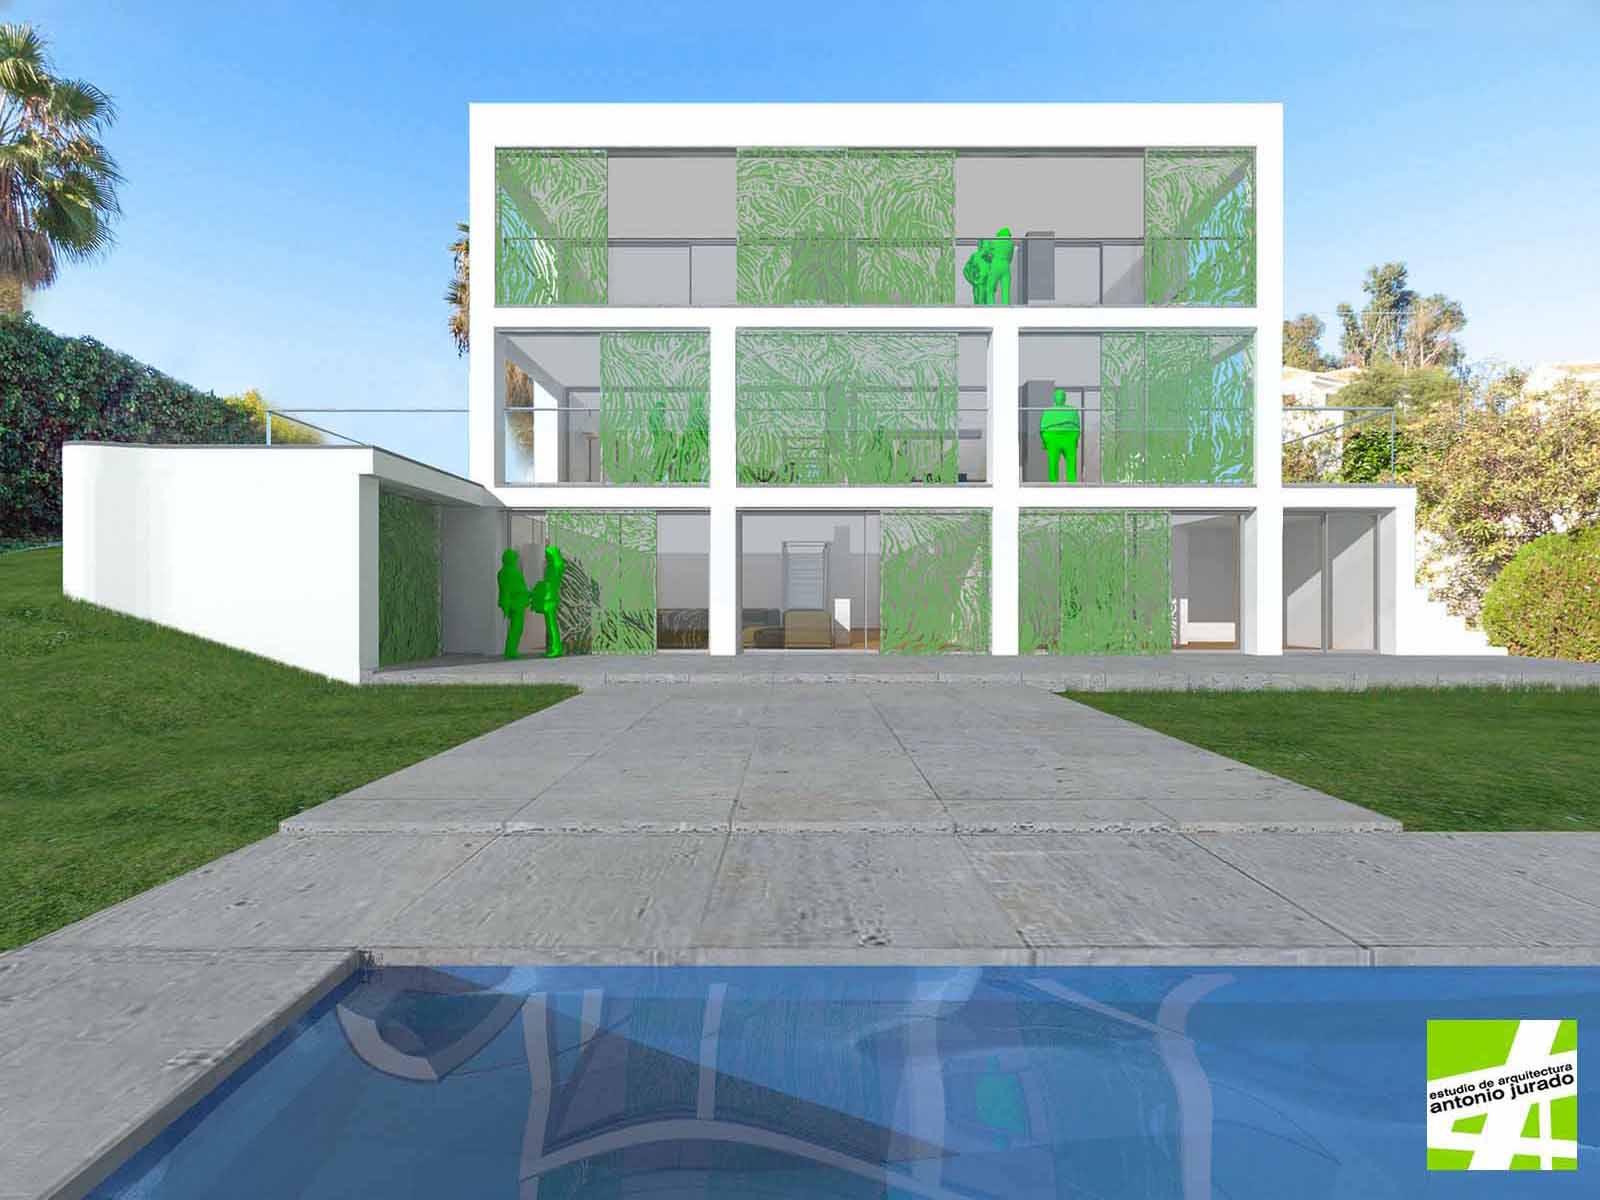 vivienda-unifamiliar-rosario-marbella-malaga-arquitecto-antonio-jurado-0